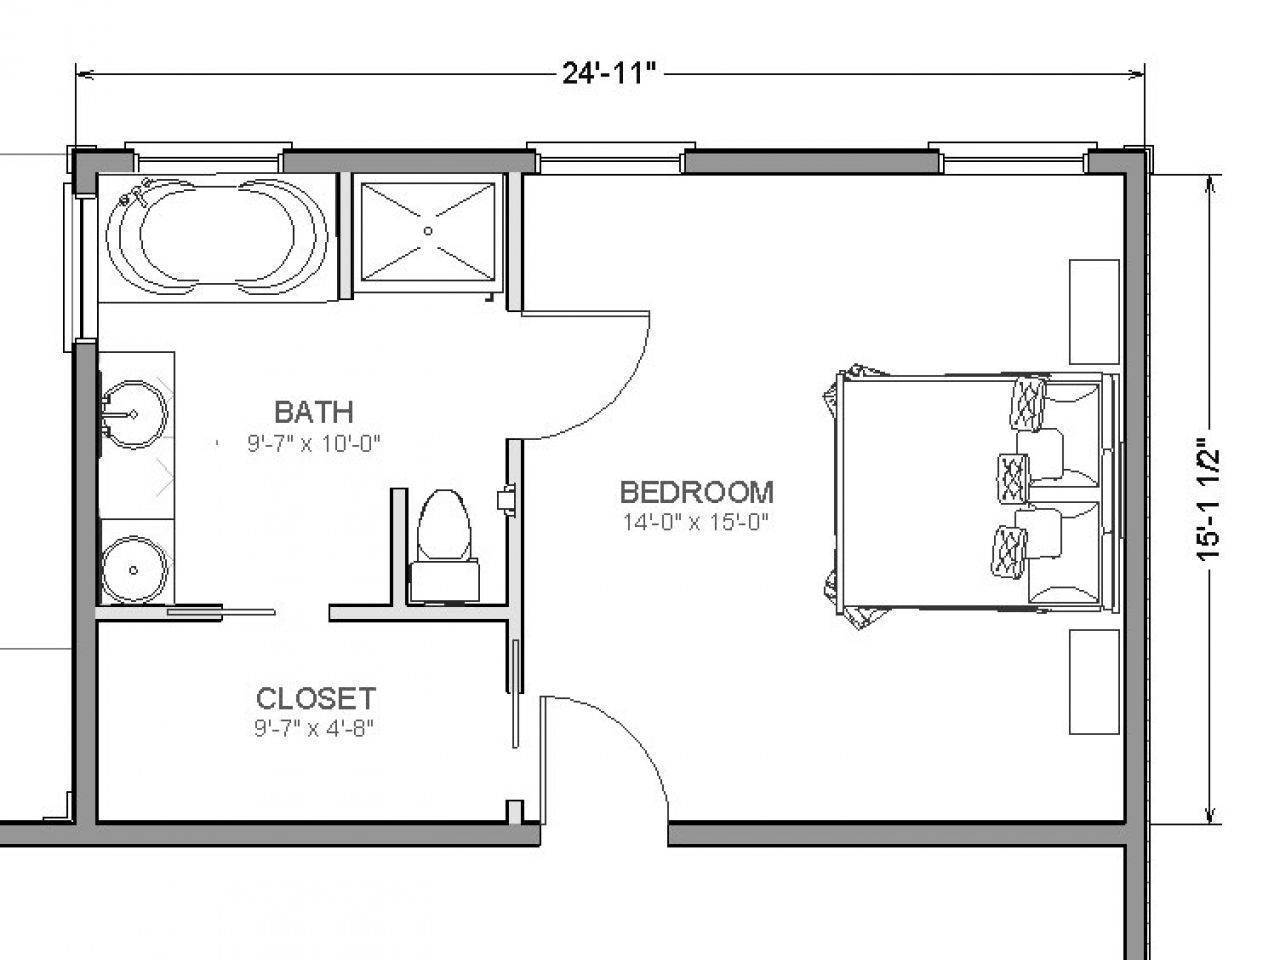 Images Luxury Master Bathroom Layout Romantic Luxury Master Bedroom Master Bedroom Suite Addit Master Bedroom Plans Master Bedroom Addition Bedroom Floor Plans